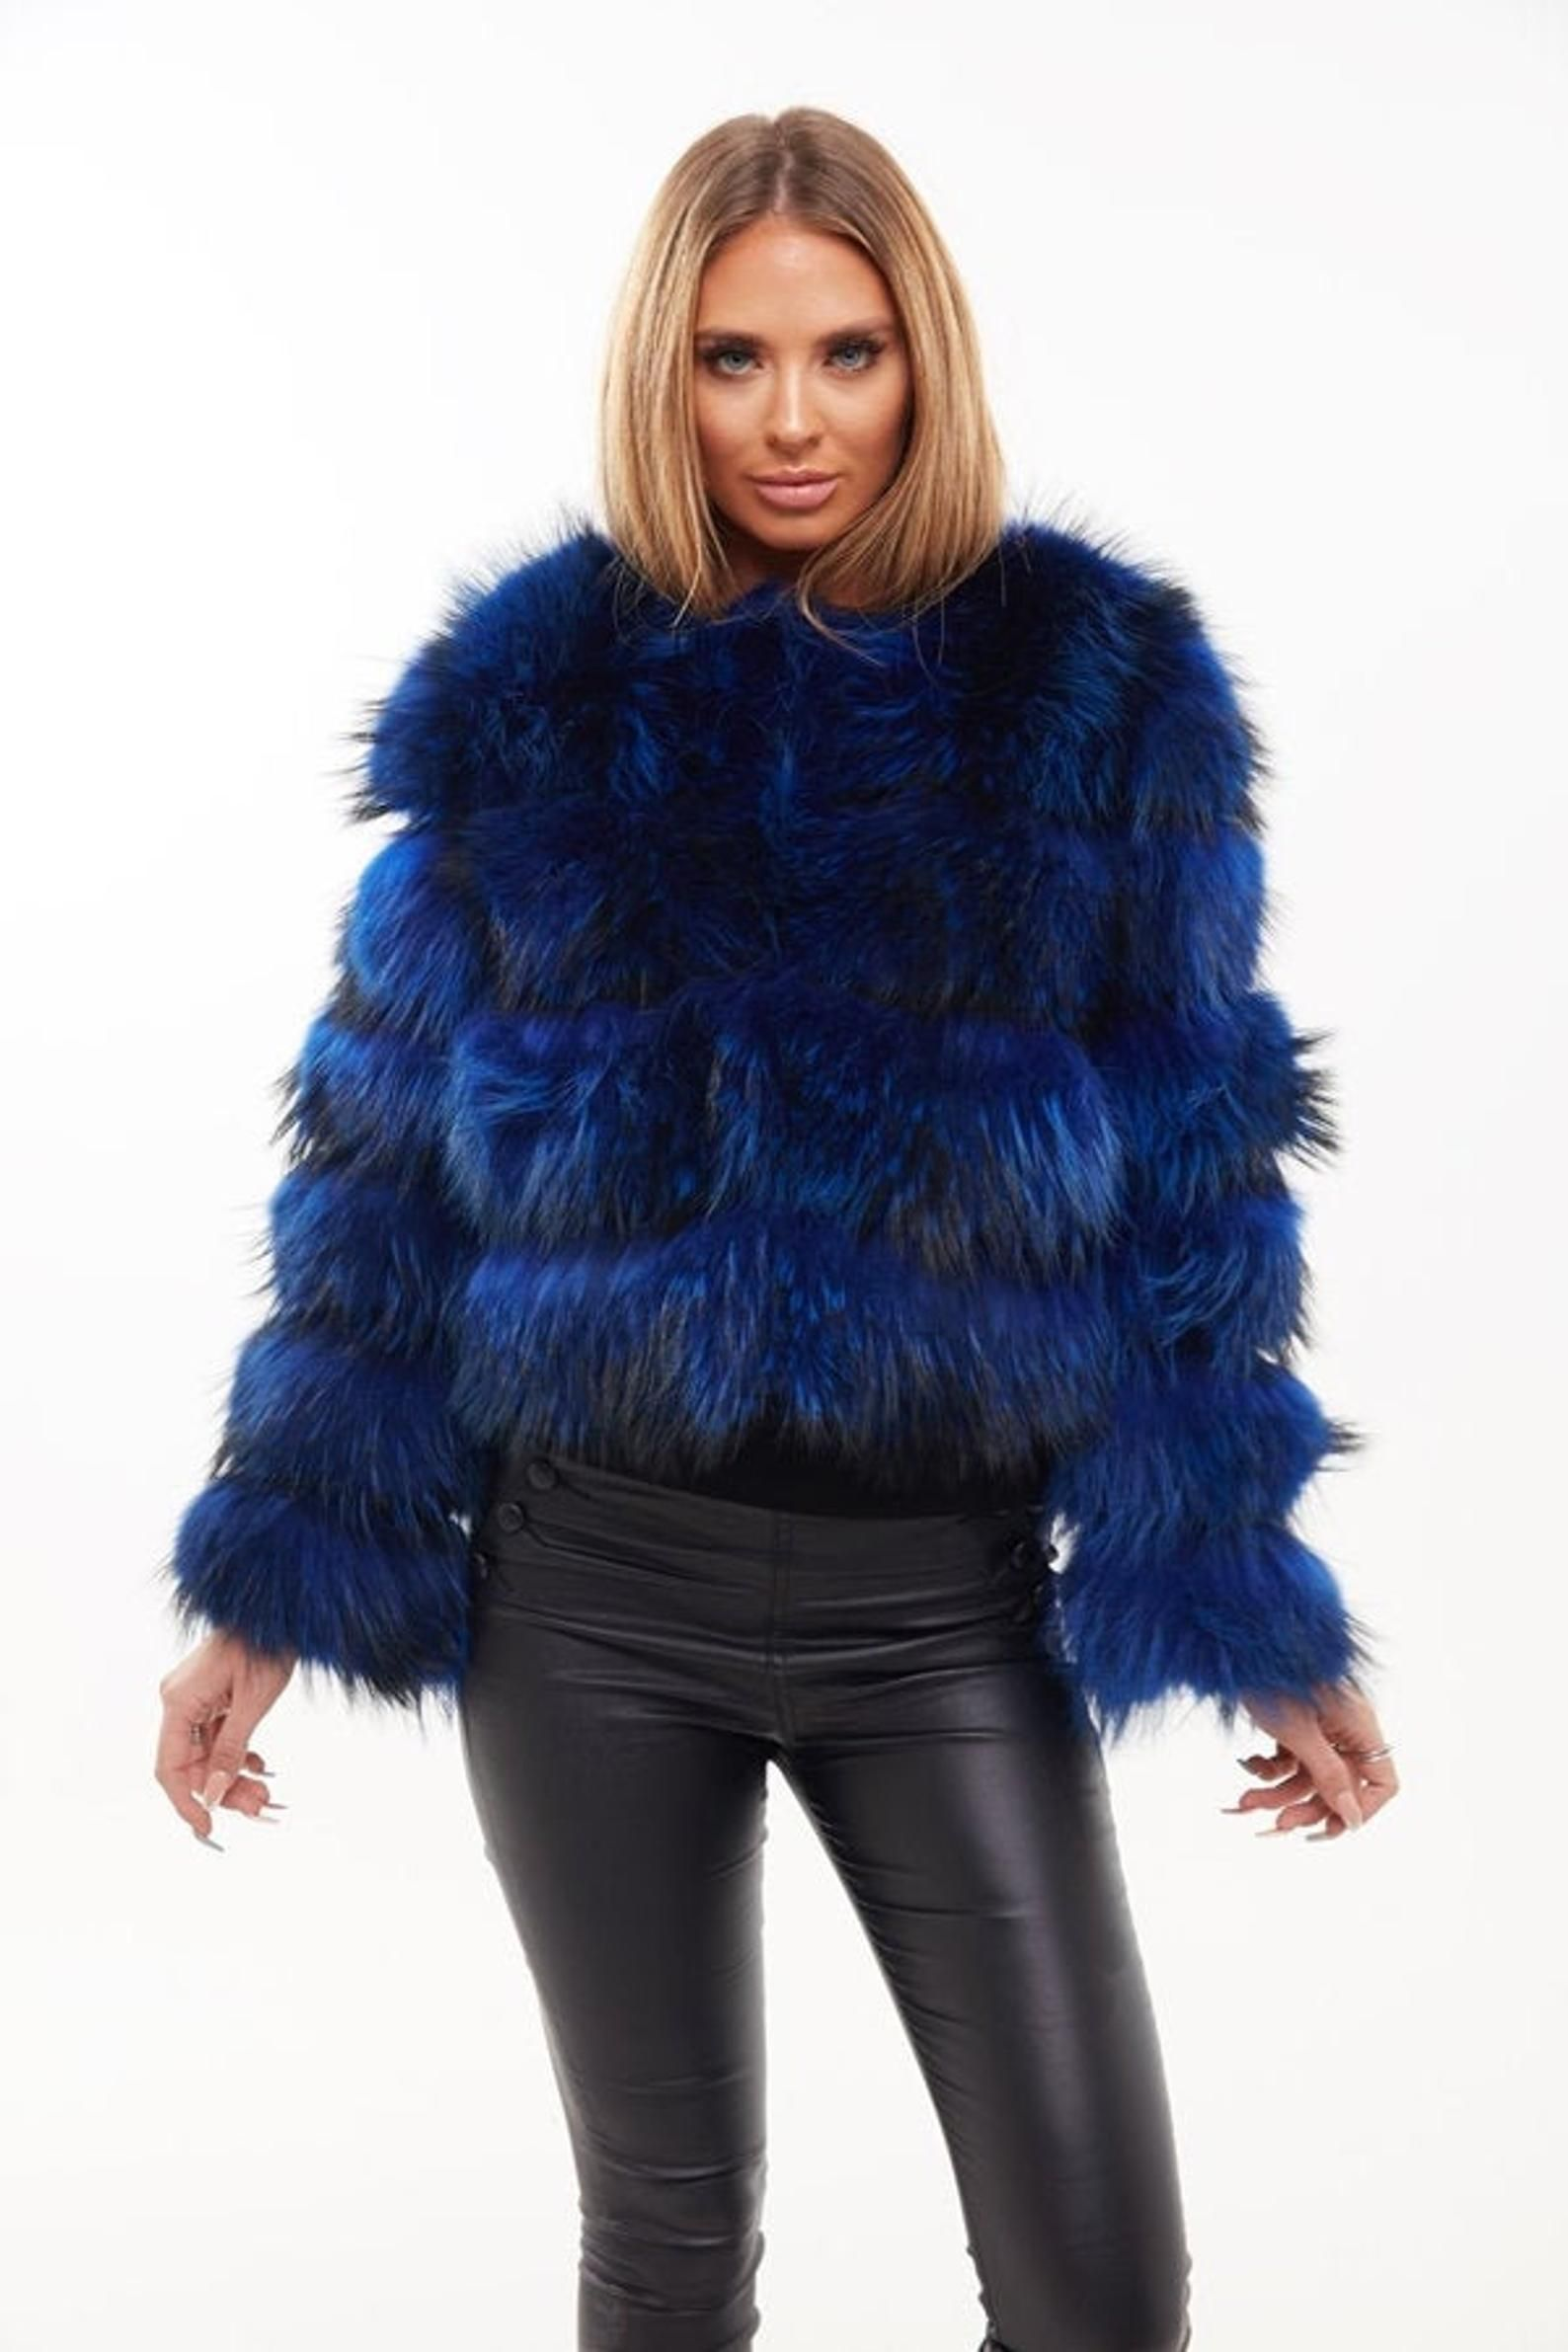 Raccoon Fur Coat Blue in 2020 Fur coat, Raccoon fur